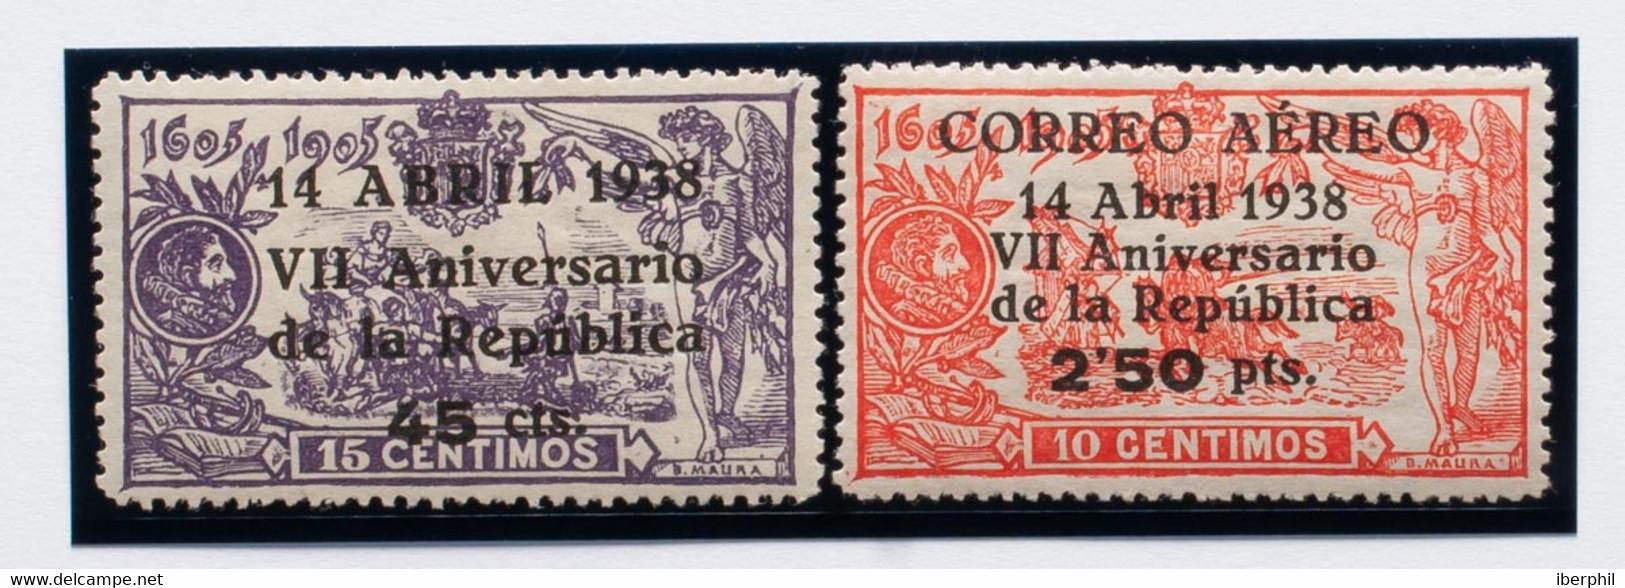 *755, 756. 1938. 45 Cts Sobre 15 Cts Violeta Y 2'50 Pts Sobre 10 Cts Rojo. Excelentes Centrajes. MAGNIFICOS. Edifil 2021 - Zonder Classificatie